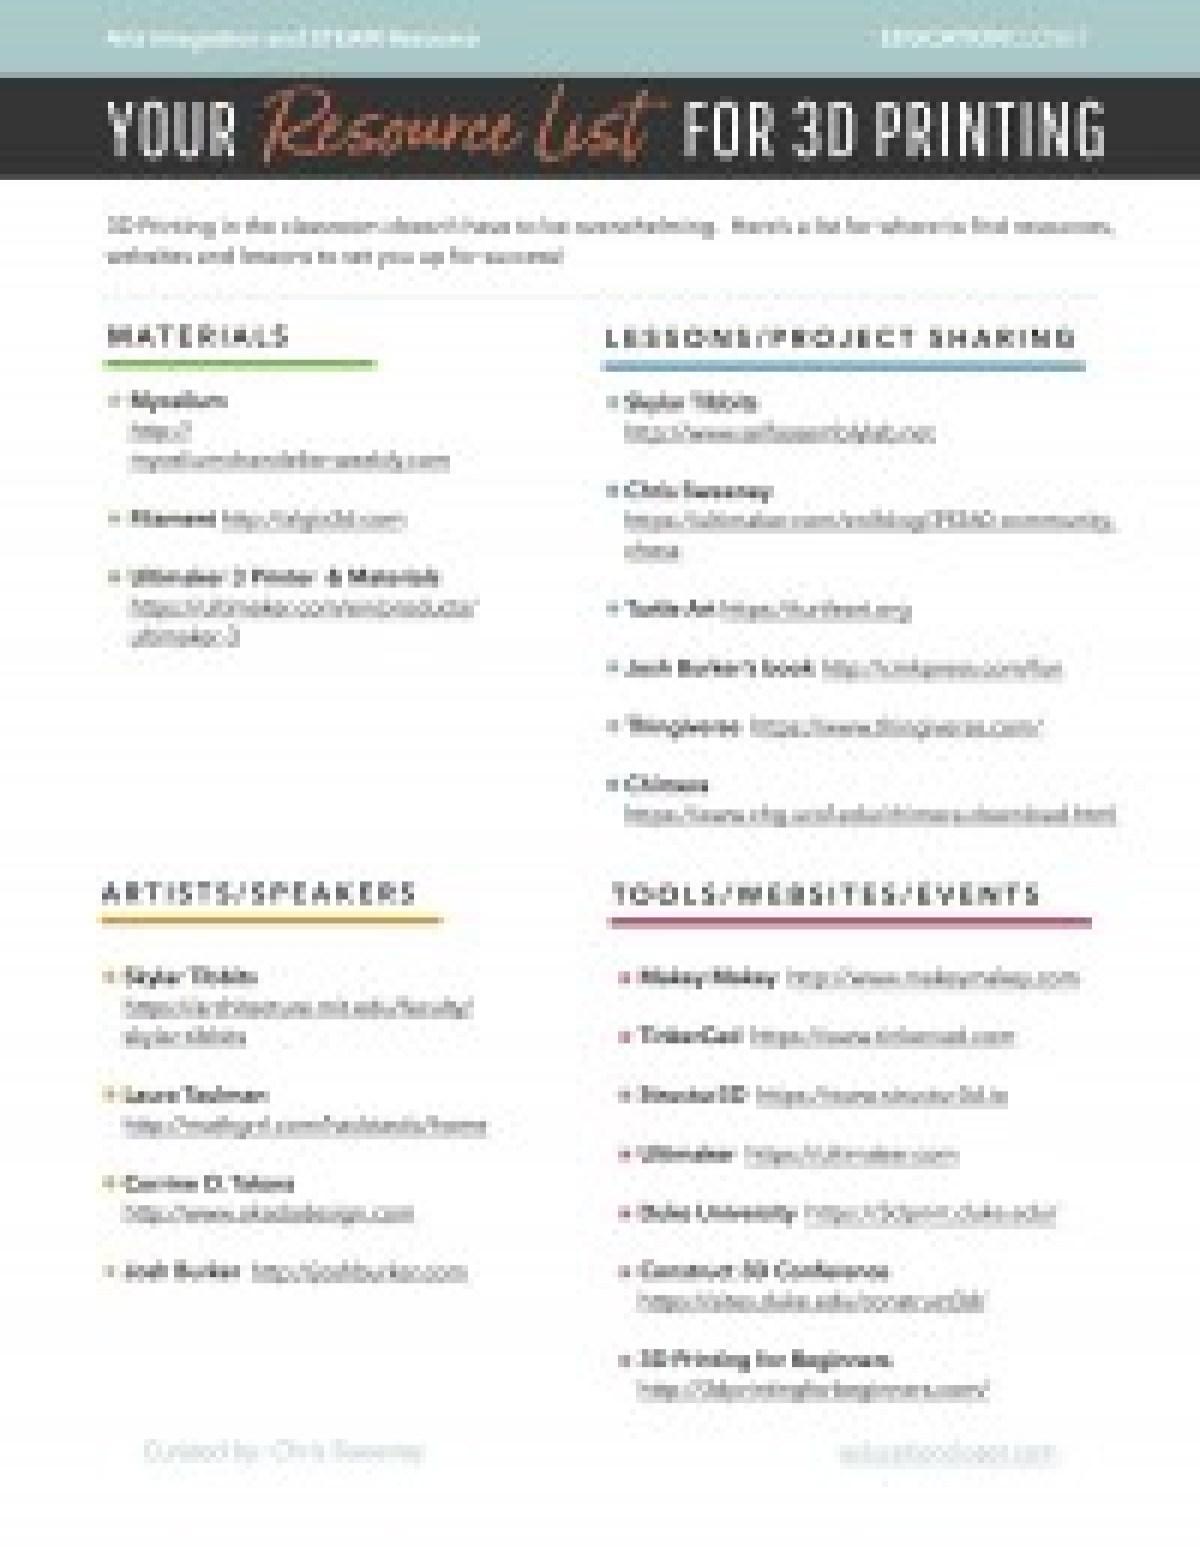 3d printing resource list